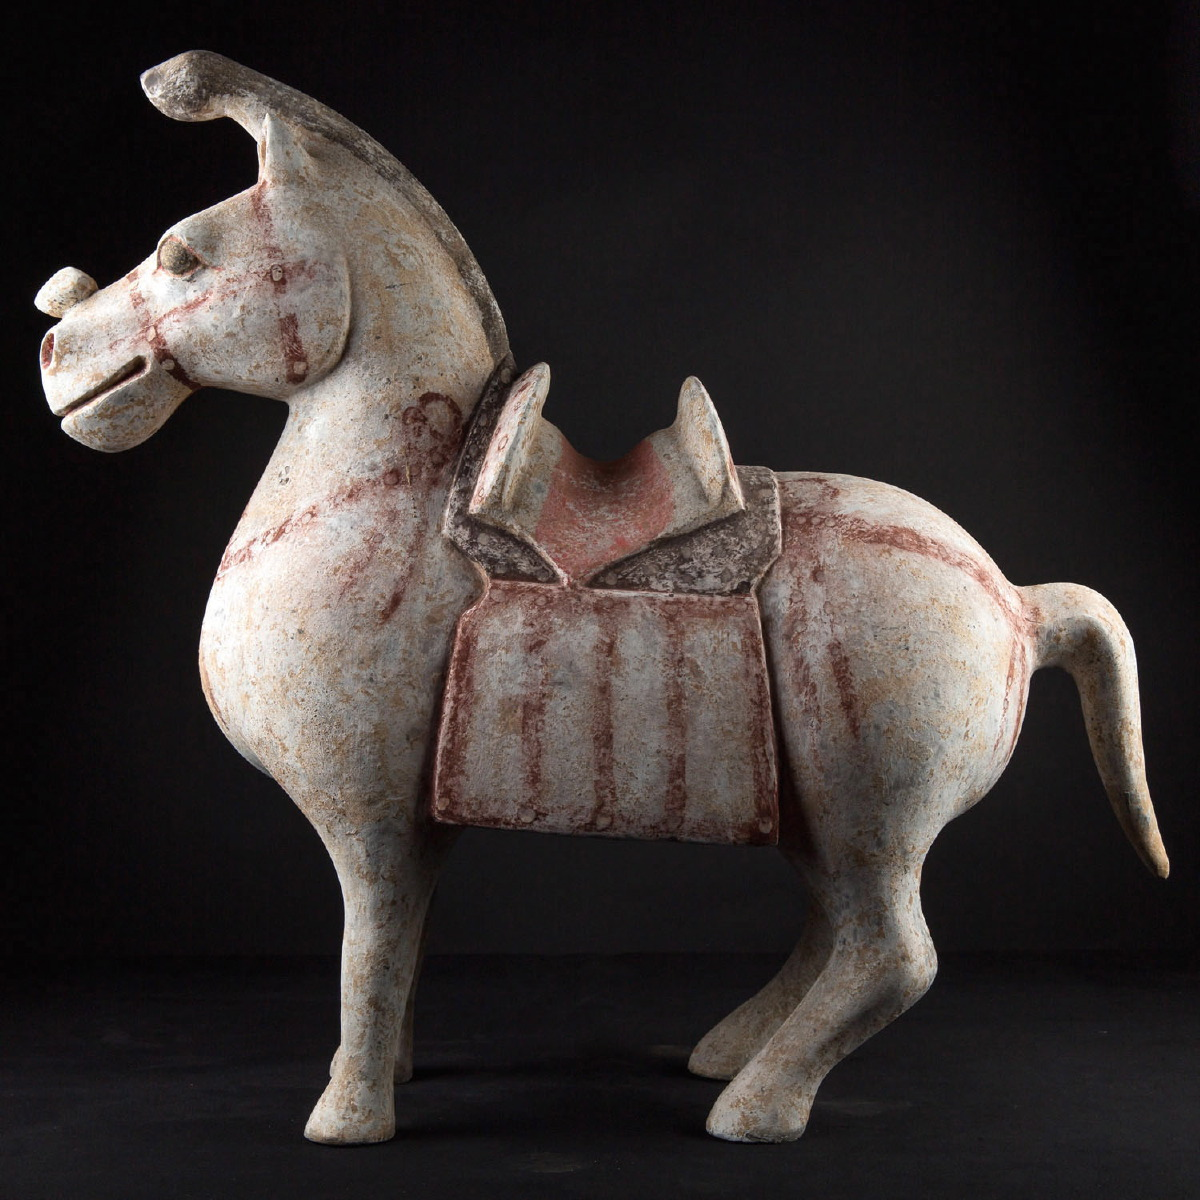 Photo of jin-horse-mongolia-rare-unicorn-galerie-golconda-collection-archeology